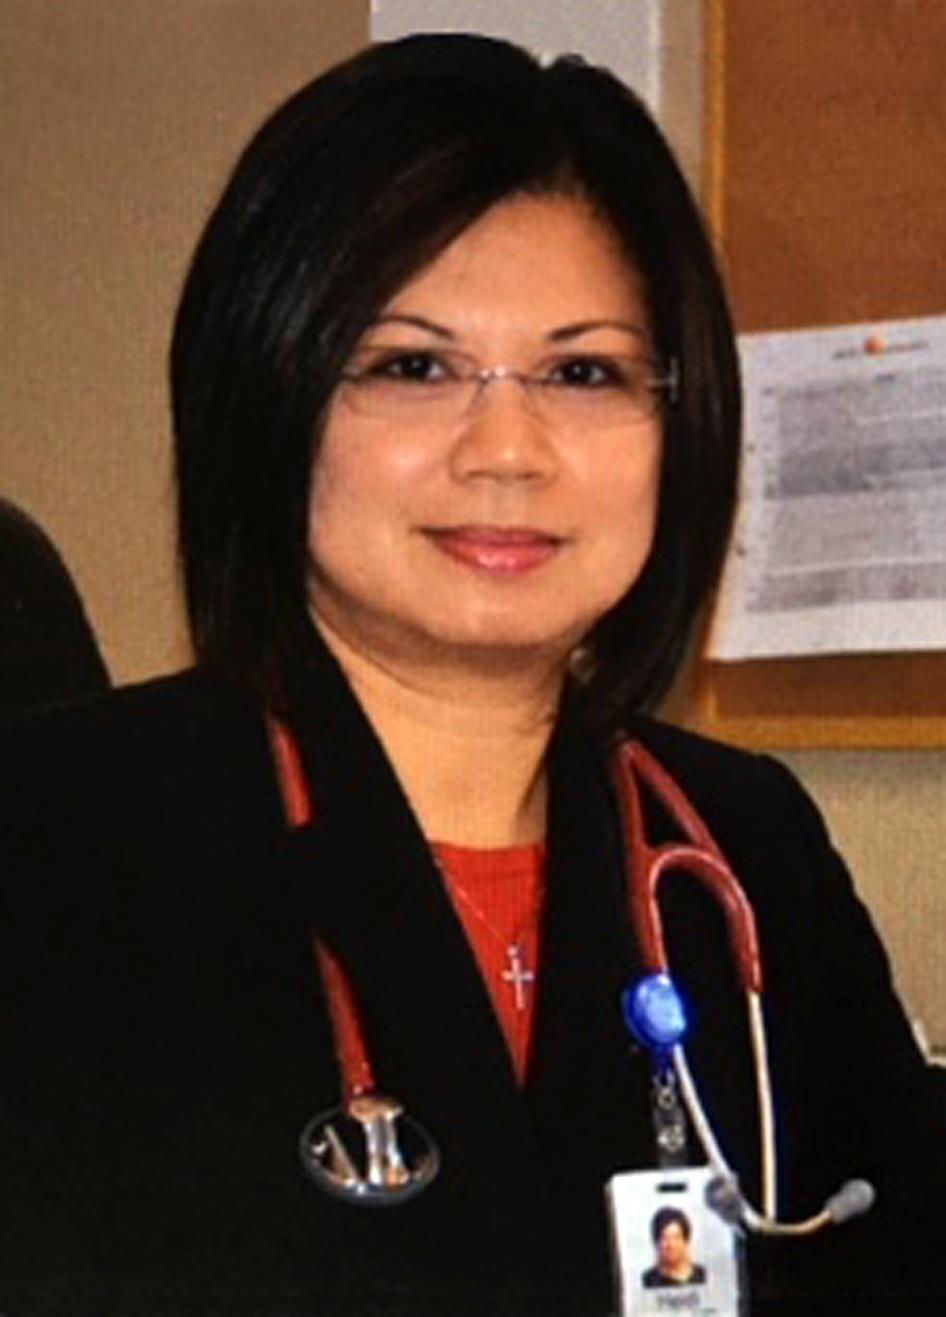 Dr. Heidi Berdin